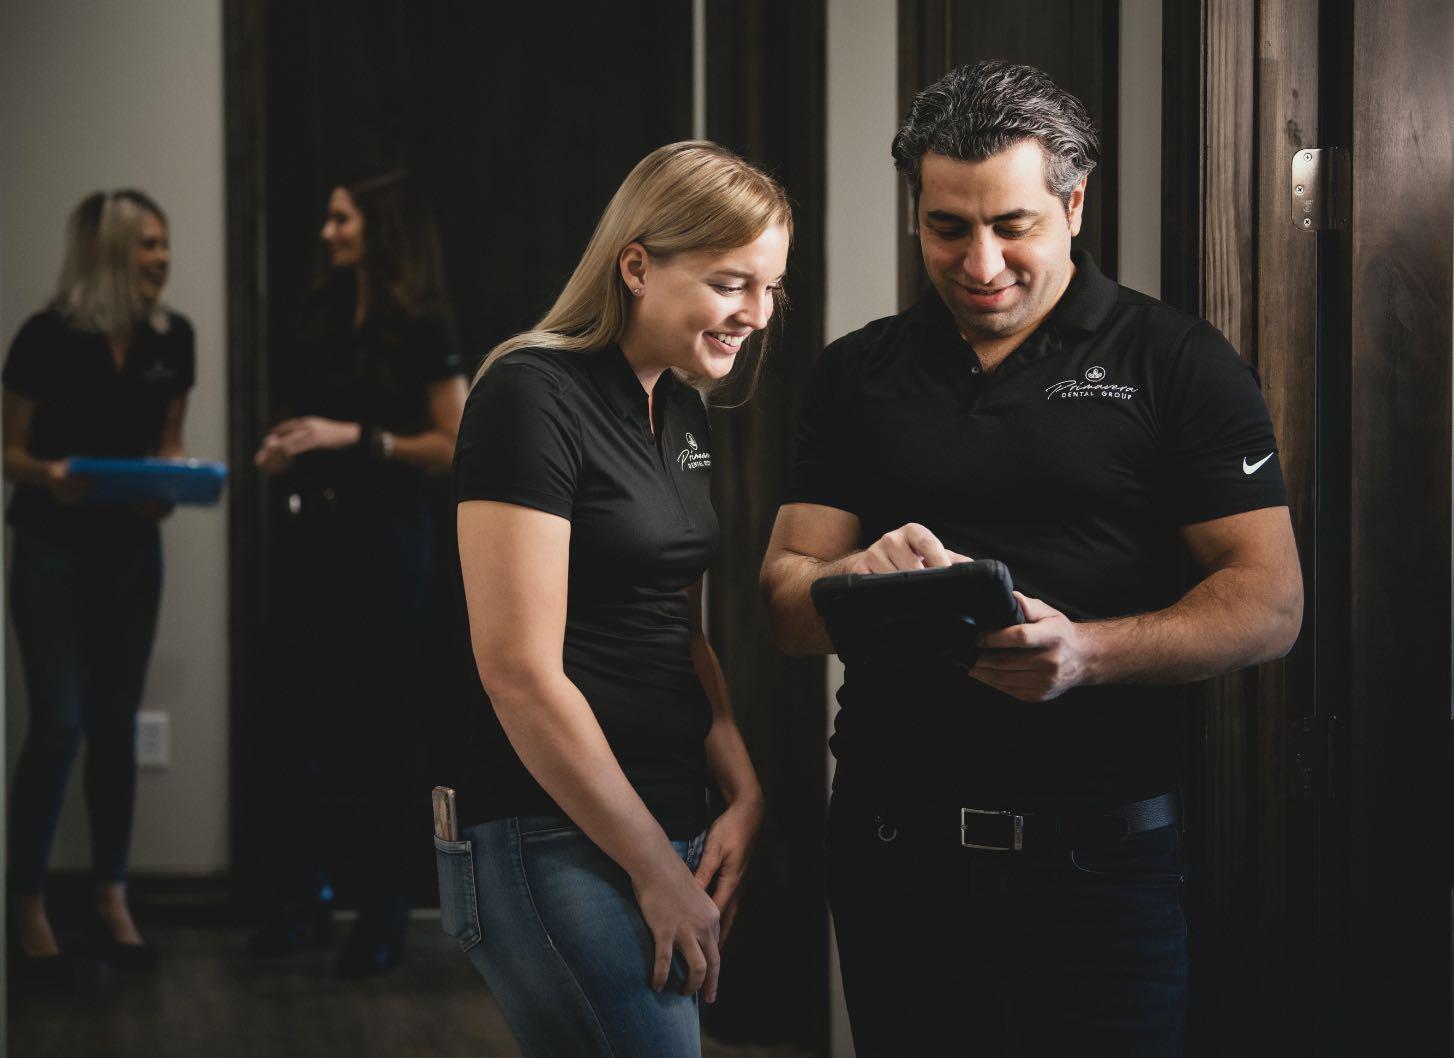 Photo of Dr. Homsi and a dental team member looking at an iPad